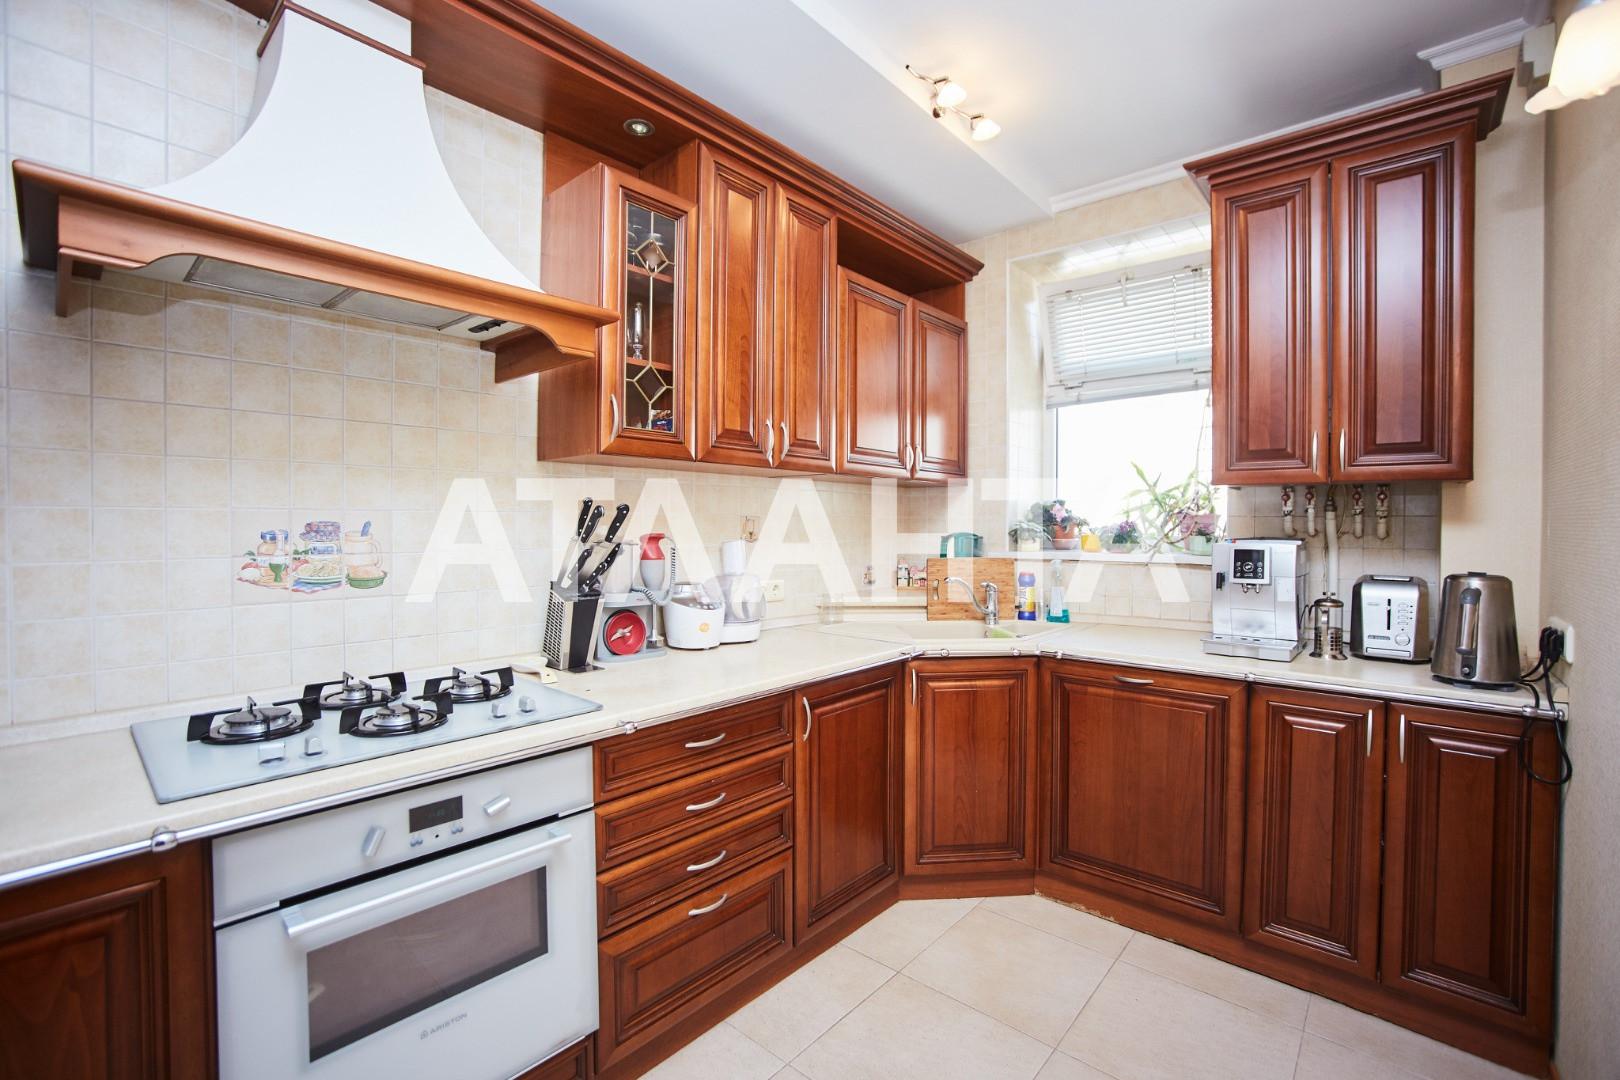 Продается Многоуровневая Квартира на ул. Посмитного — 295 000 у.е. (фото №9)